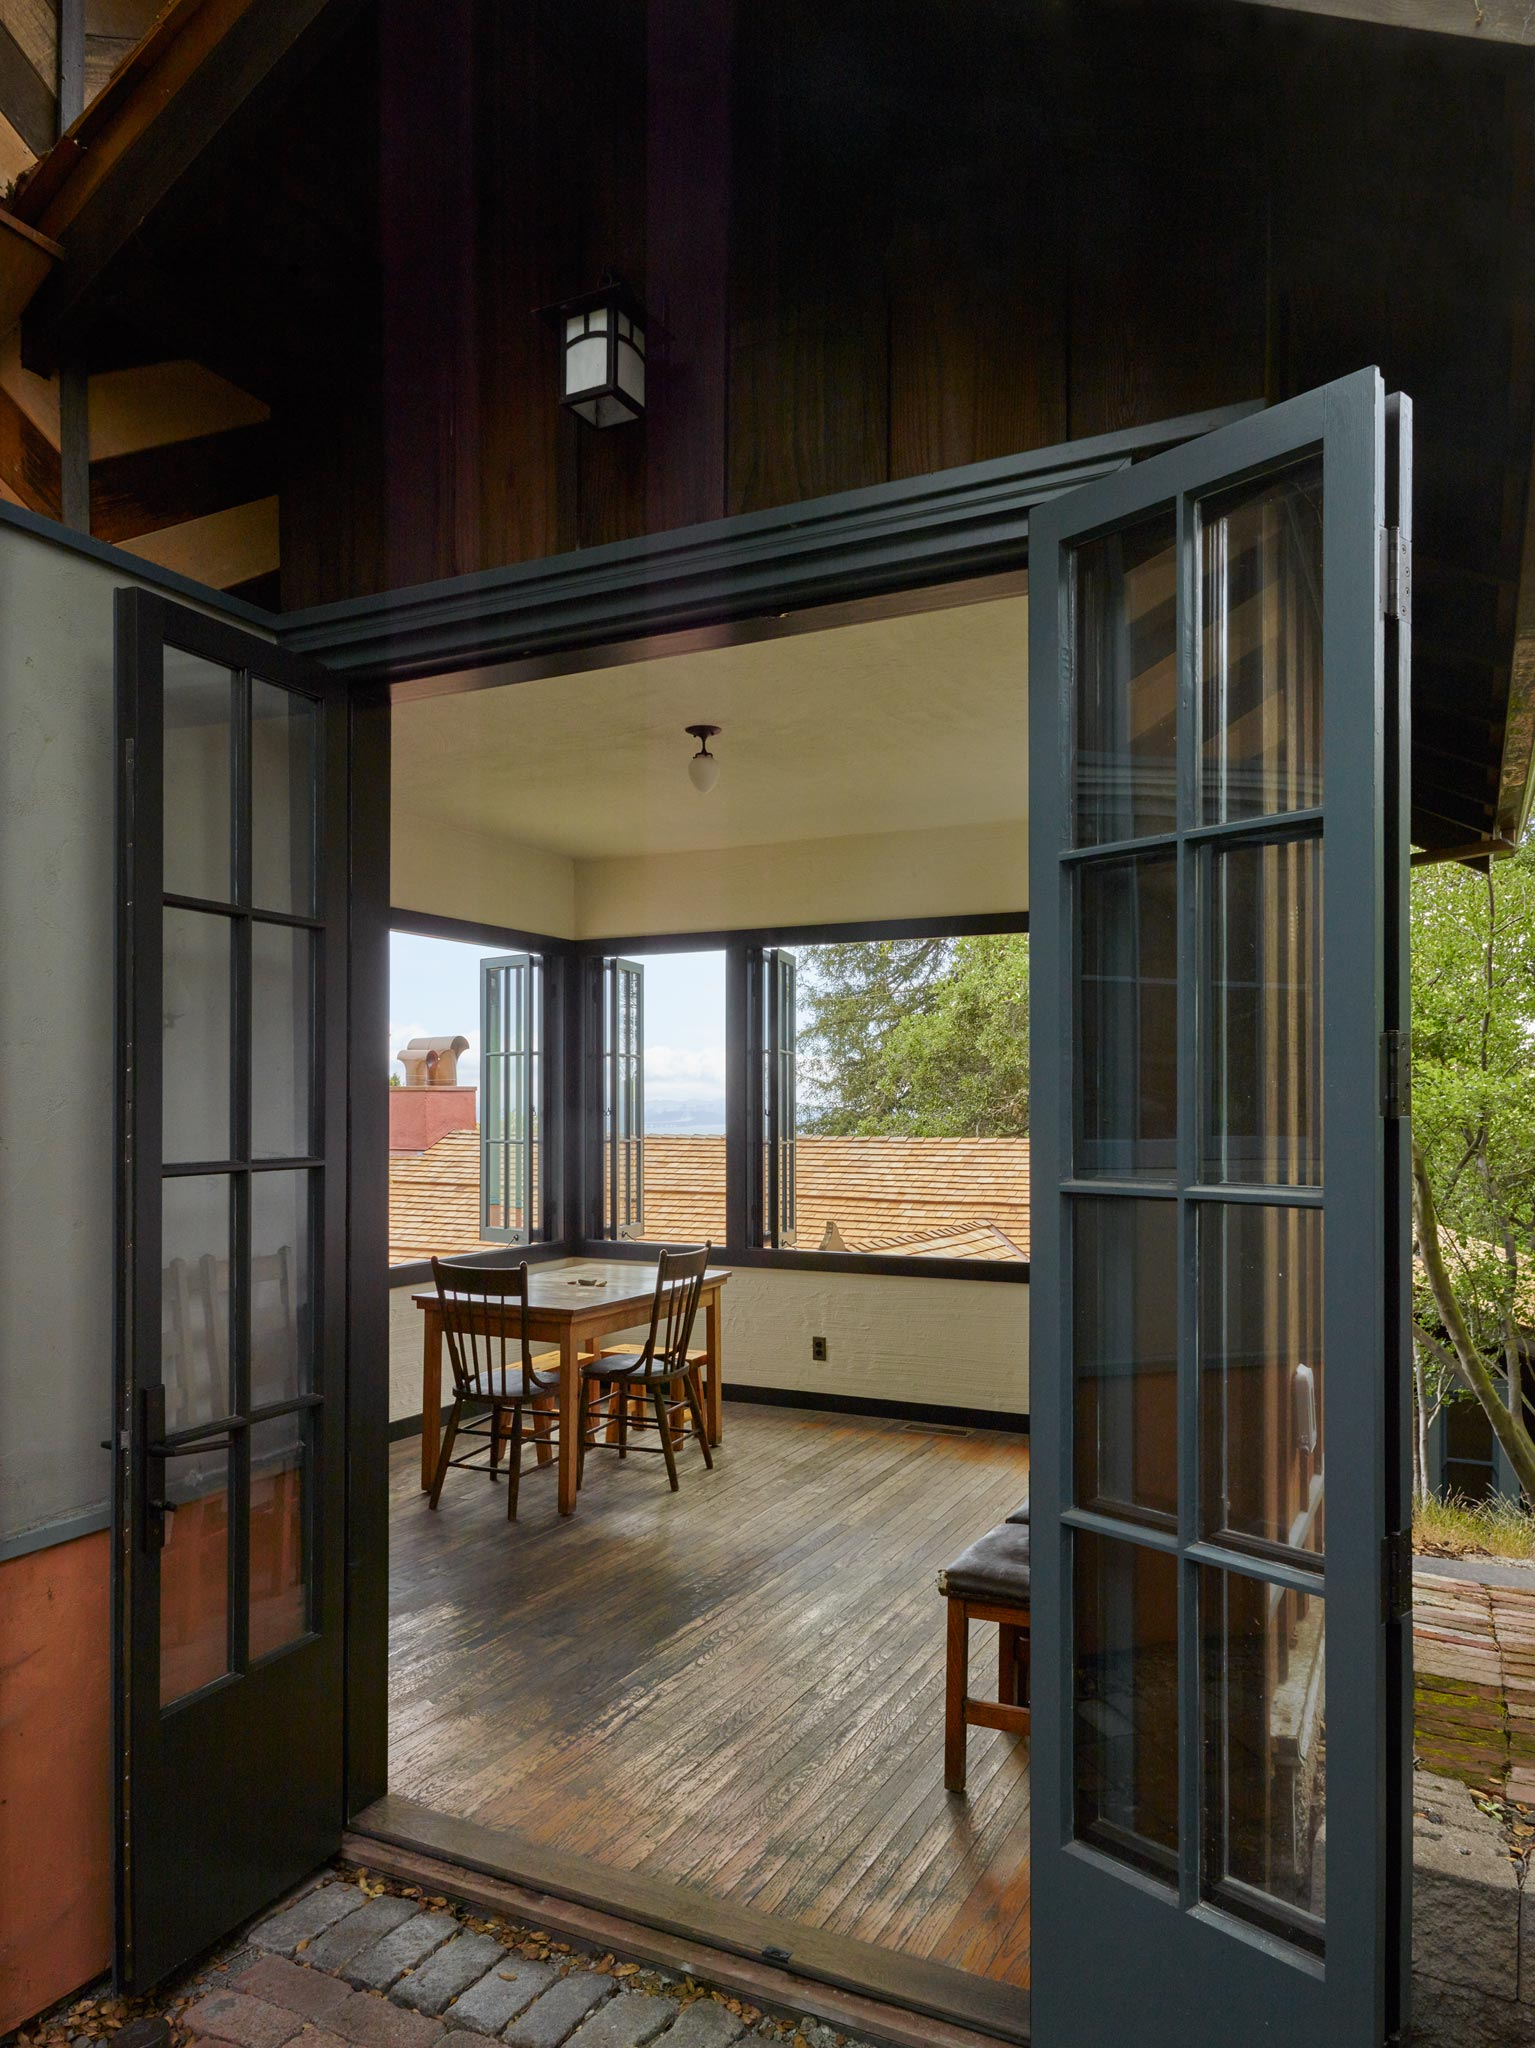 Tolman Cottages restoration of local landmark inside view of living space